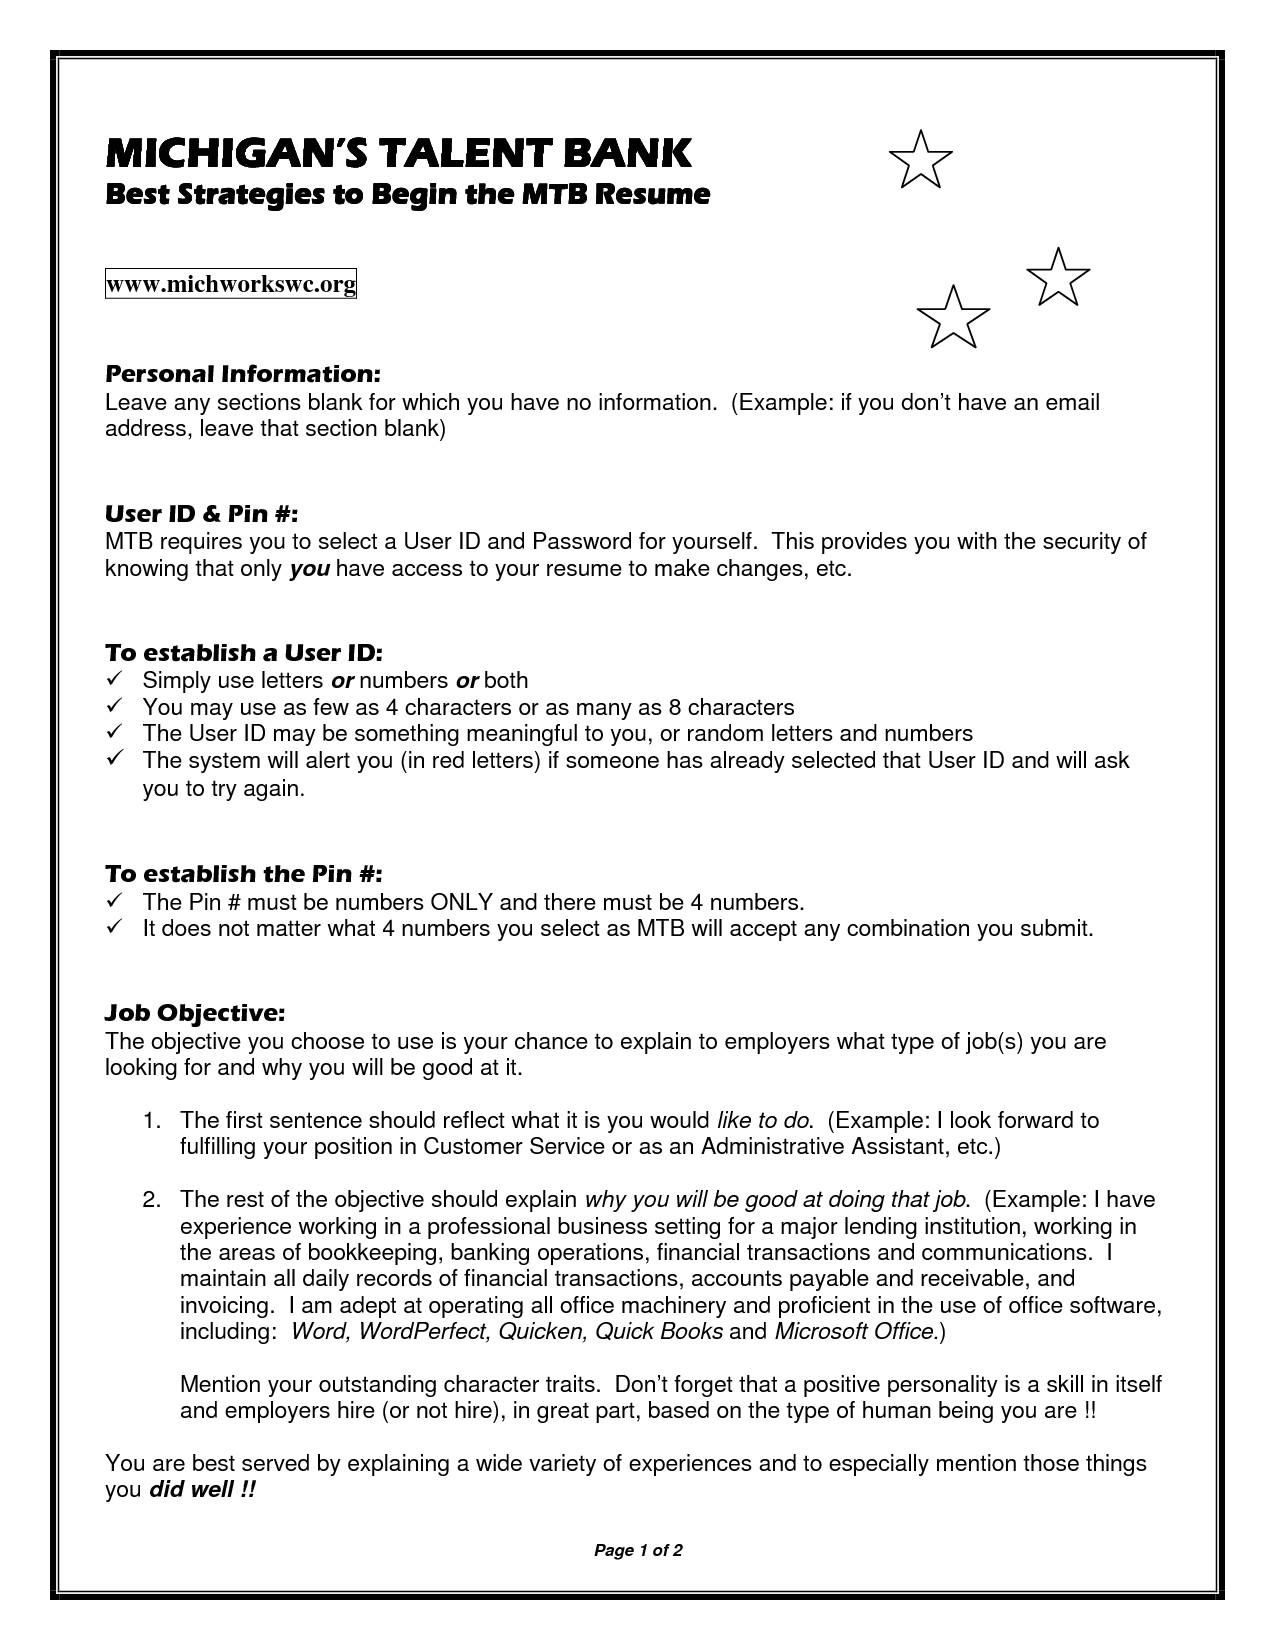 Michigan Works Resume Template Michigan Works Resume Template Resume Template 2018